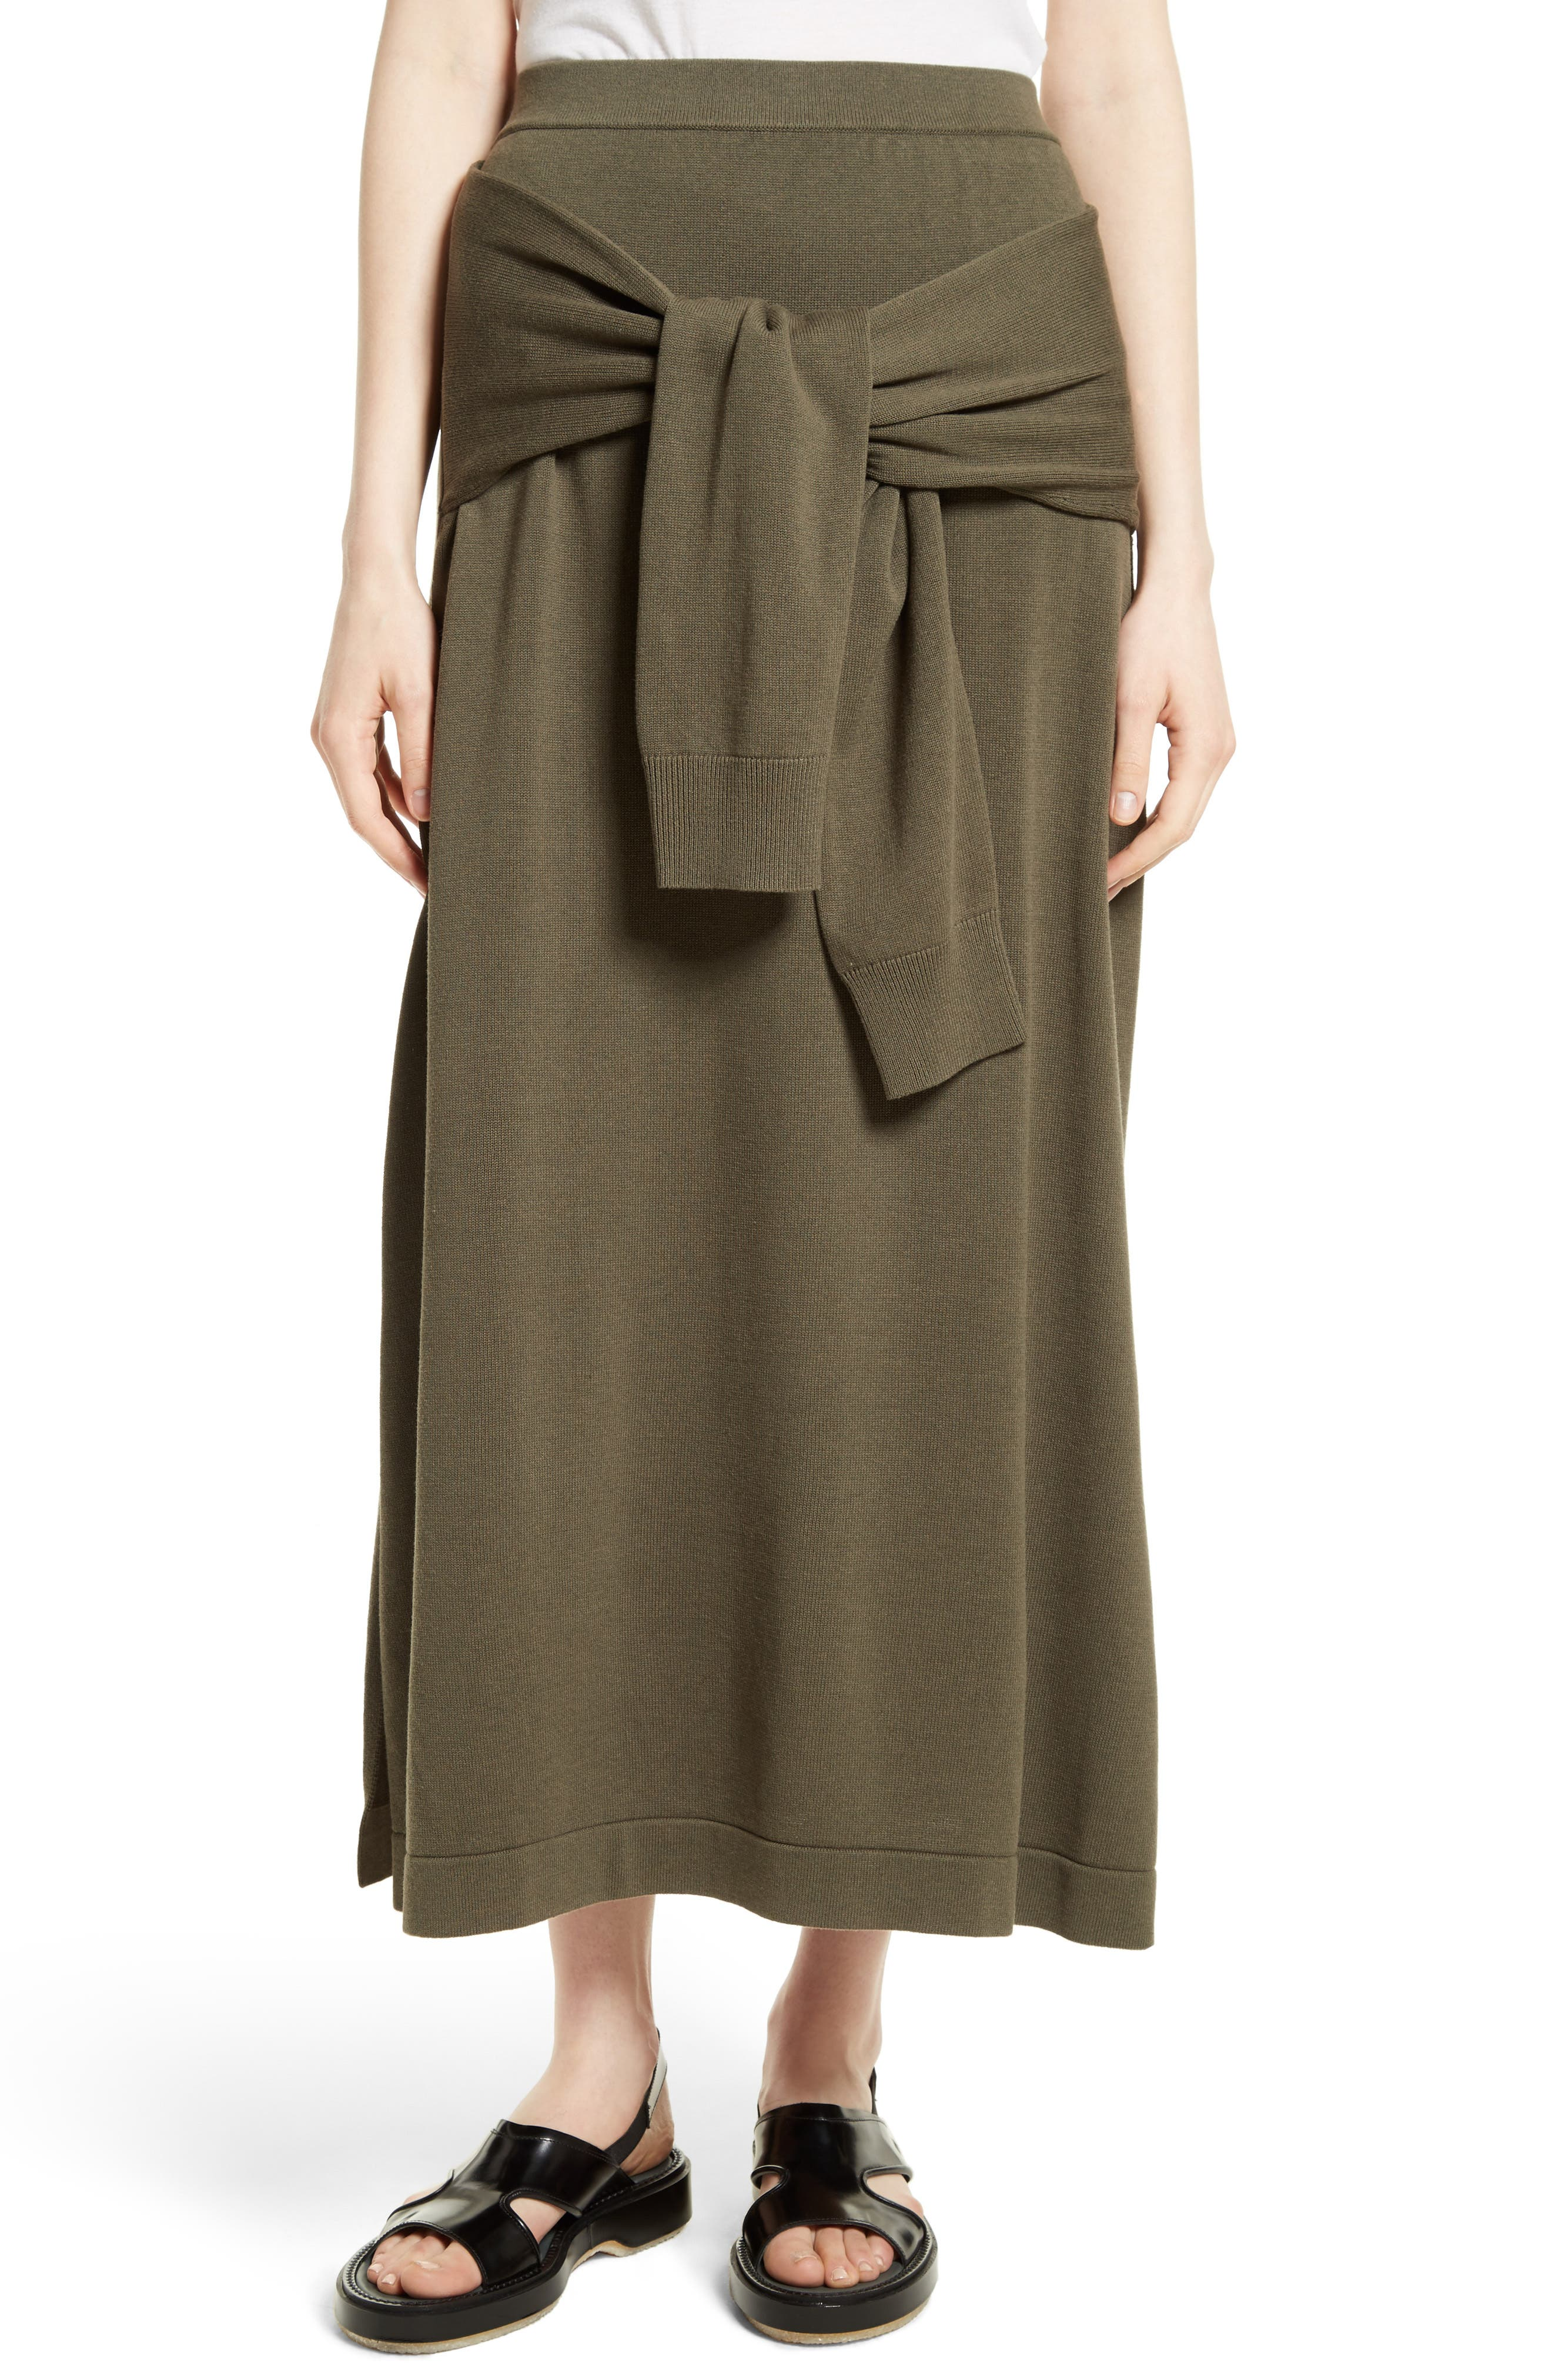 joseph tie detail knit maxi skirt nordstrom